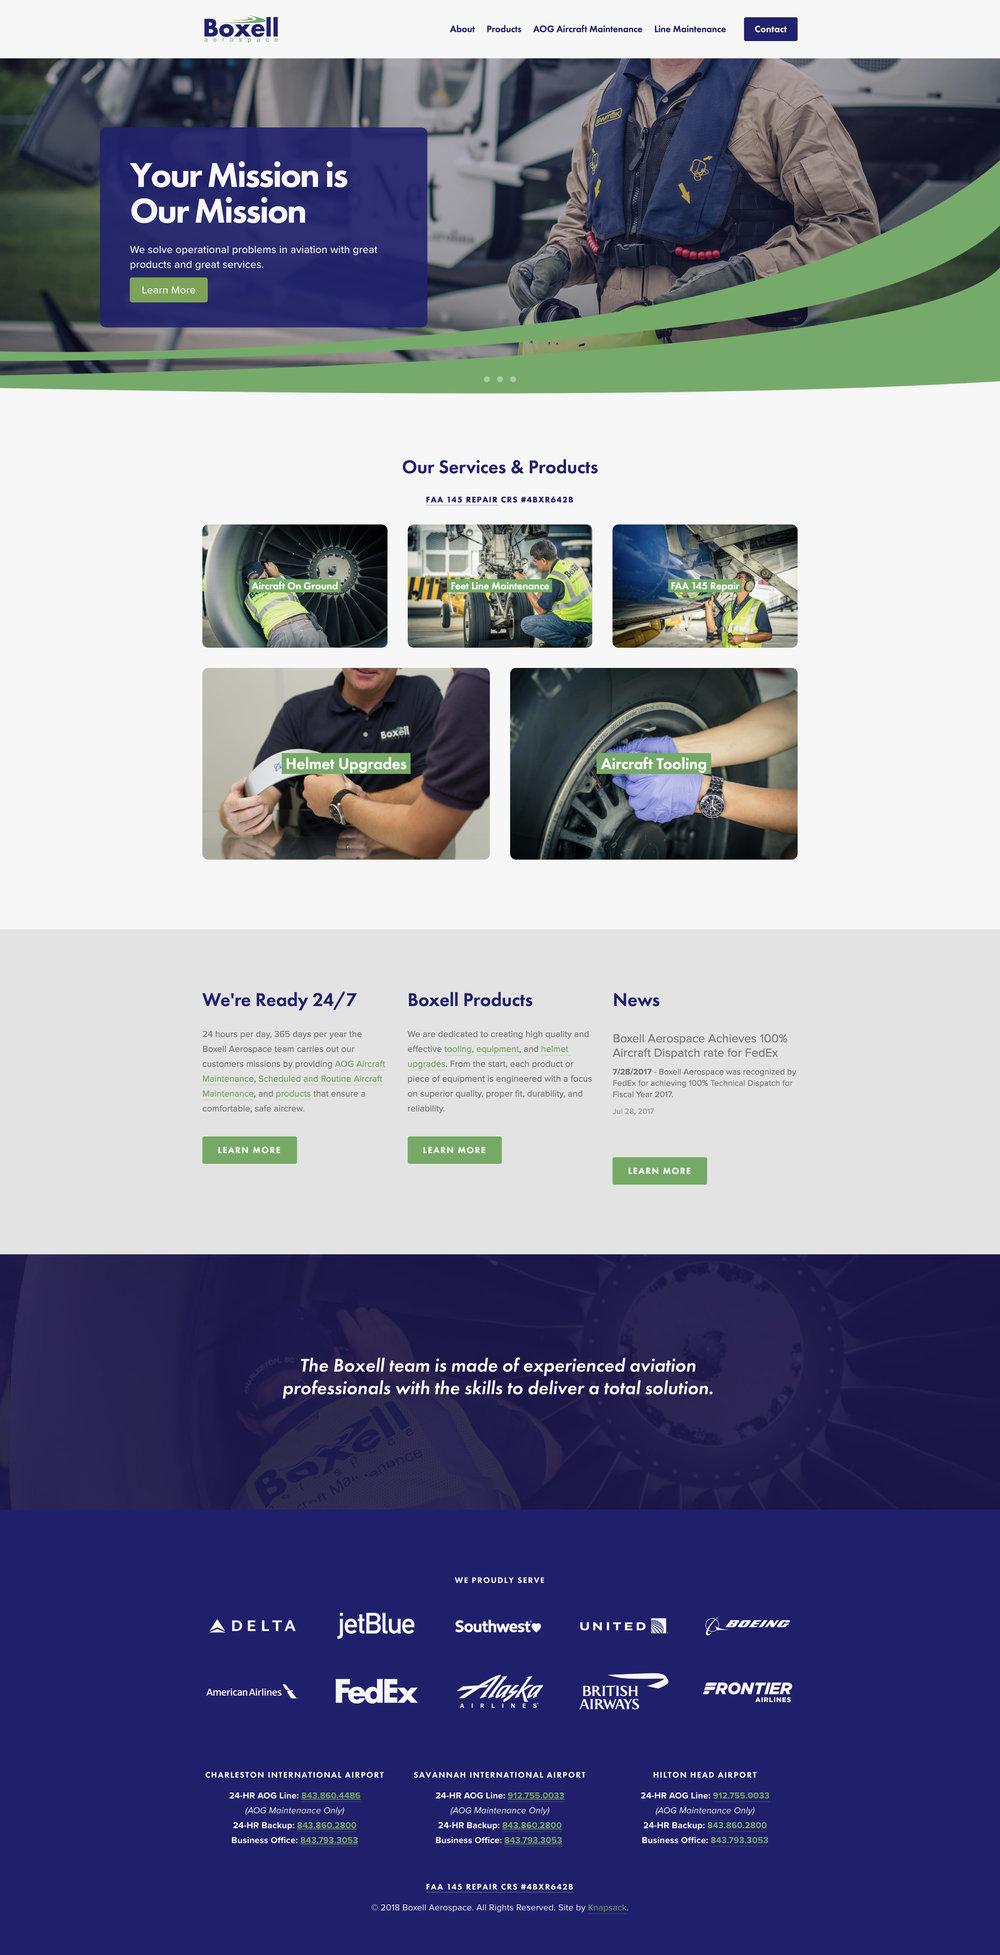 Boxell-Home-Macbook-Overlay.jpg